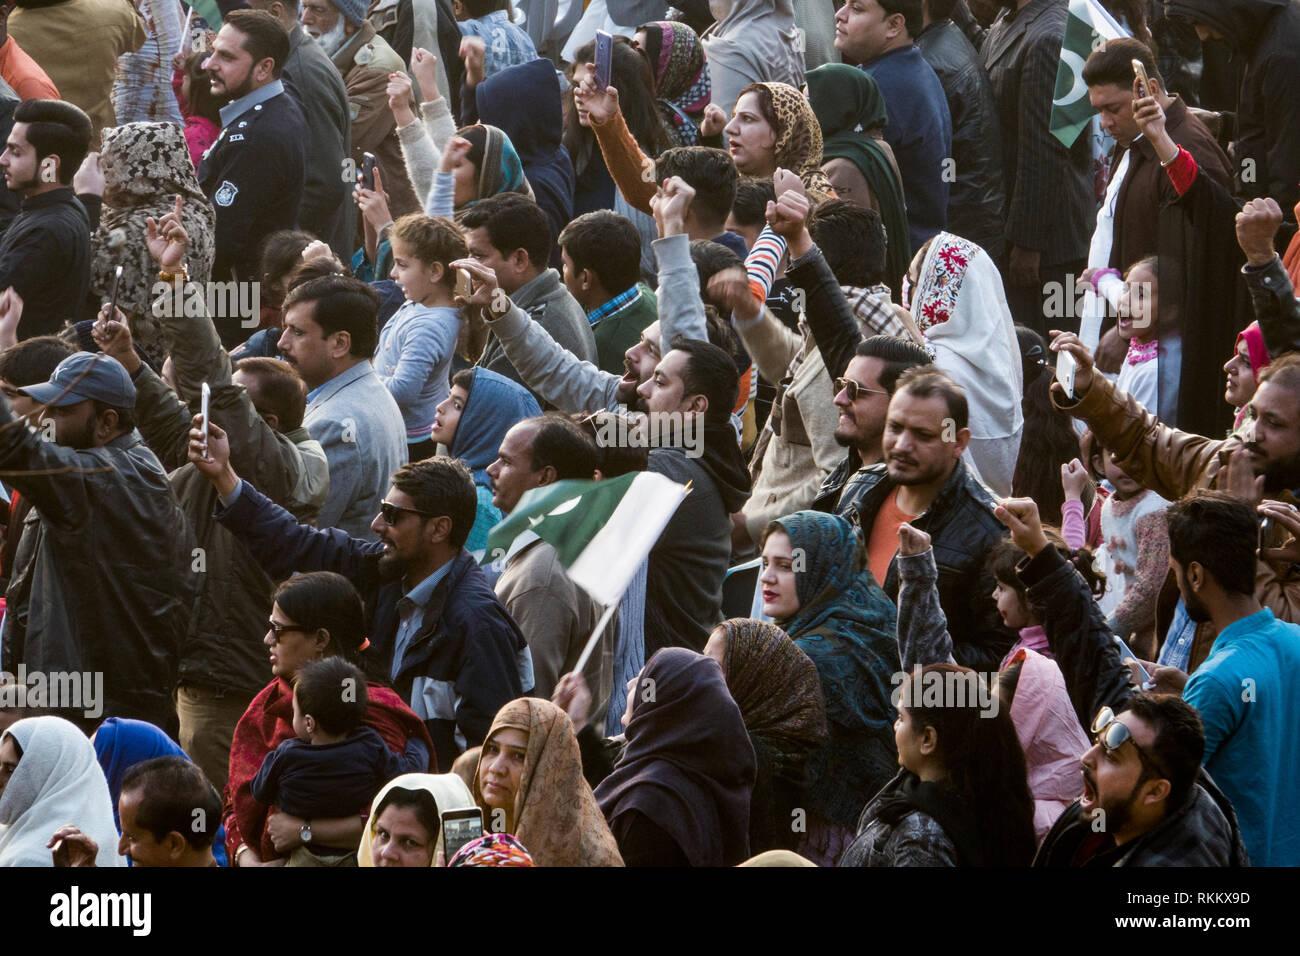 Pakistani crowd at border ceremony in Wagah, Lahore, Punjab, Pakistan - Stock Image